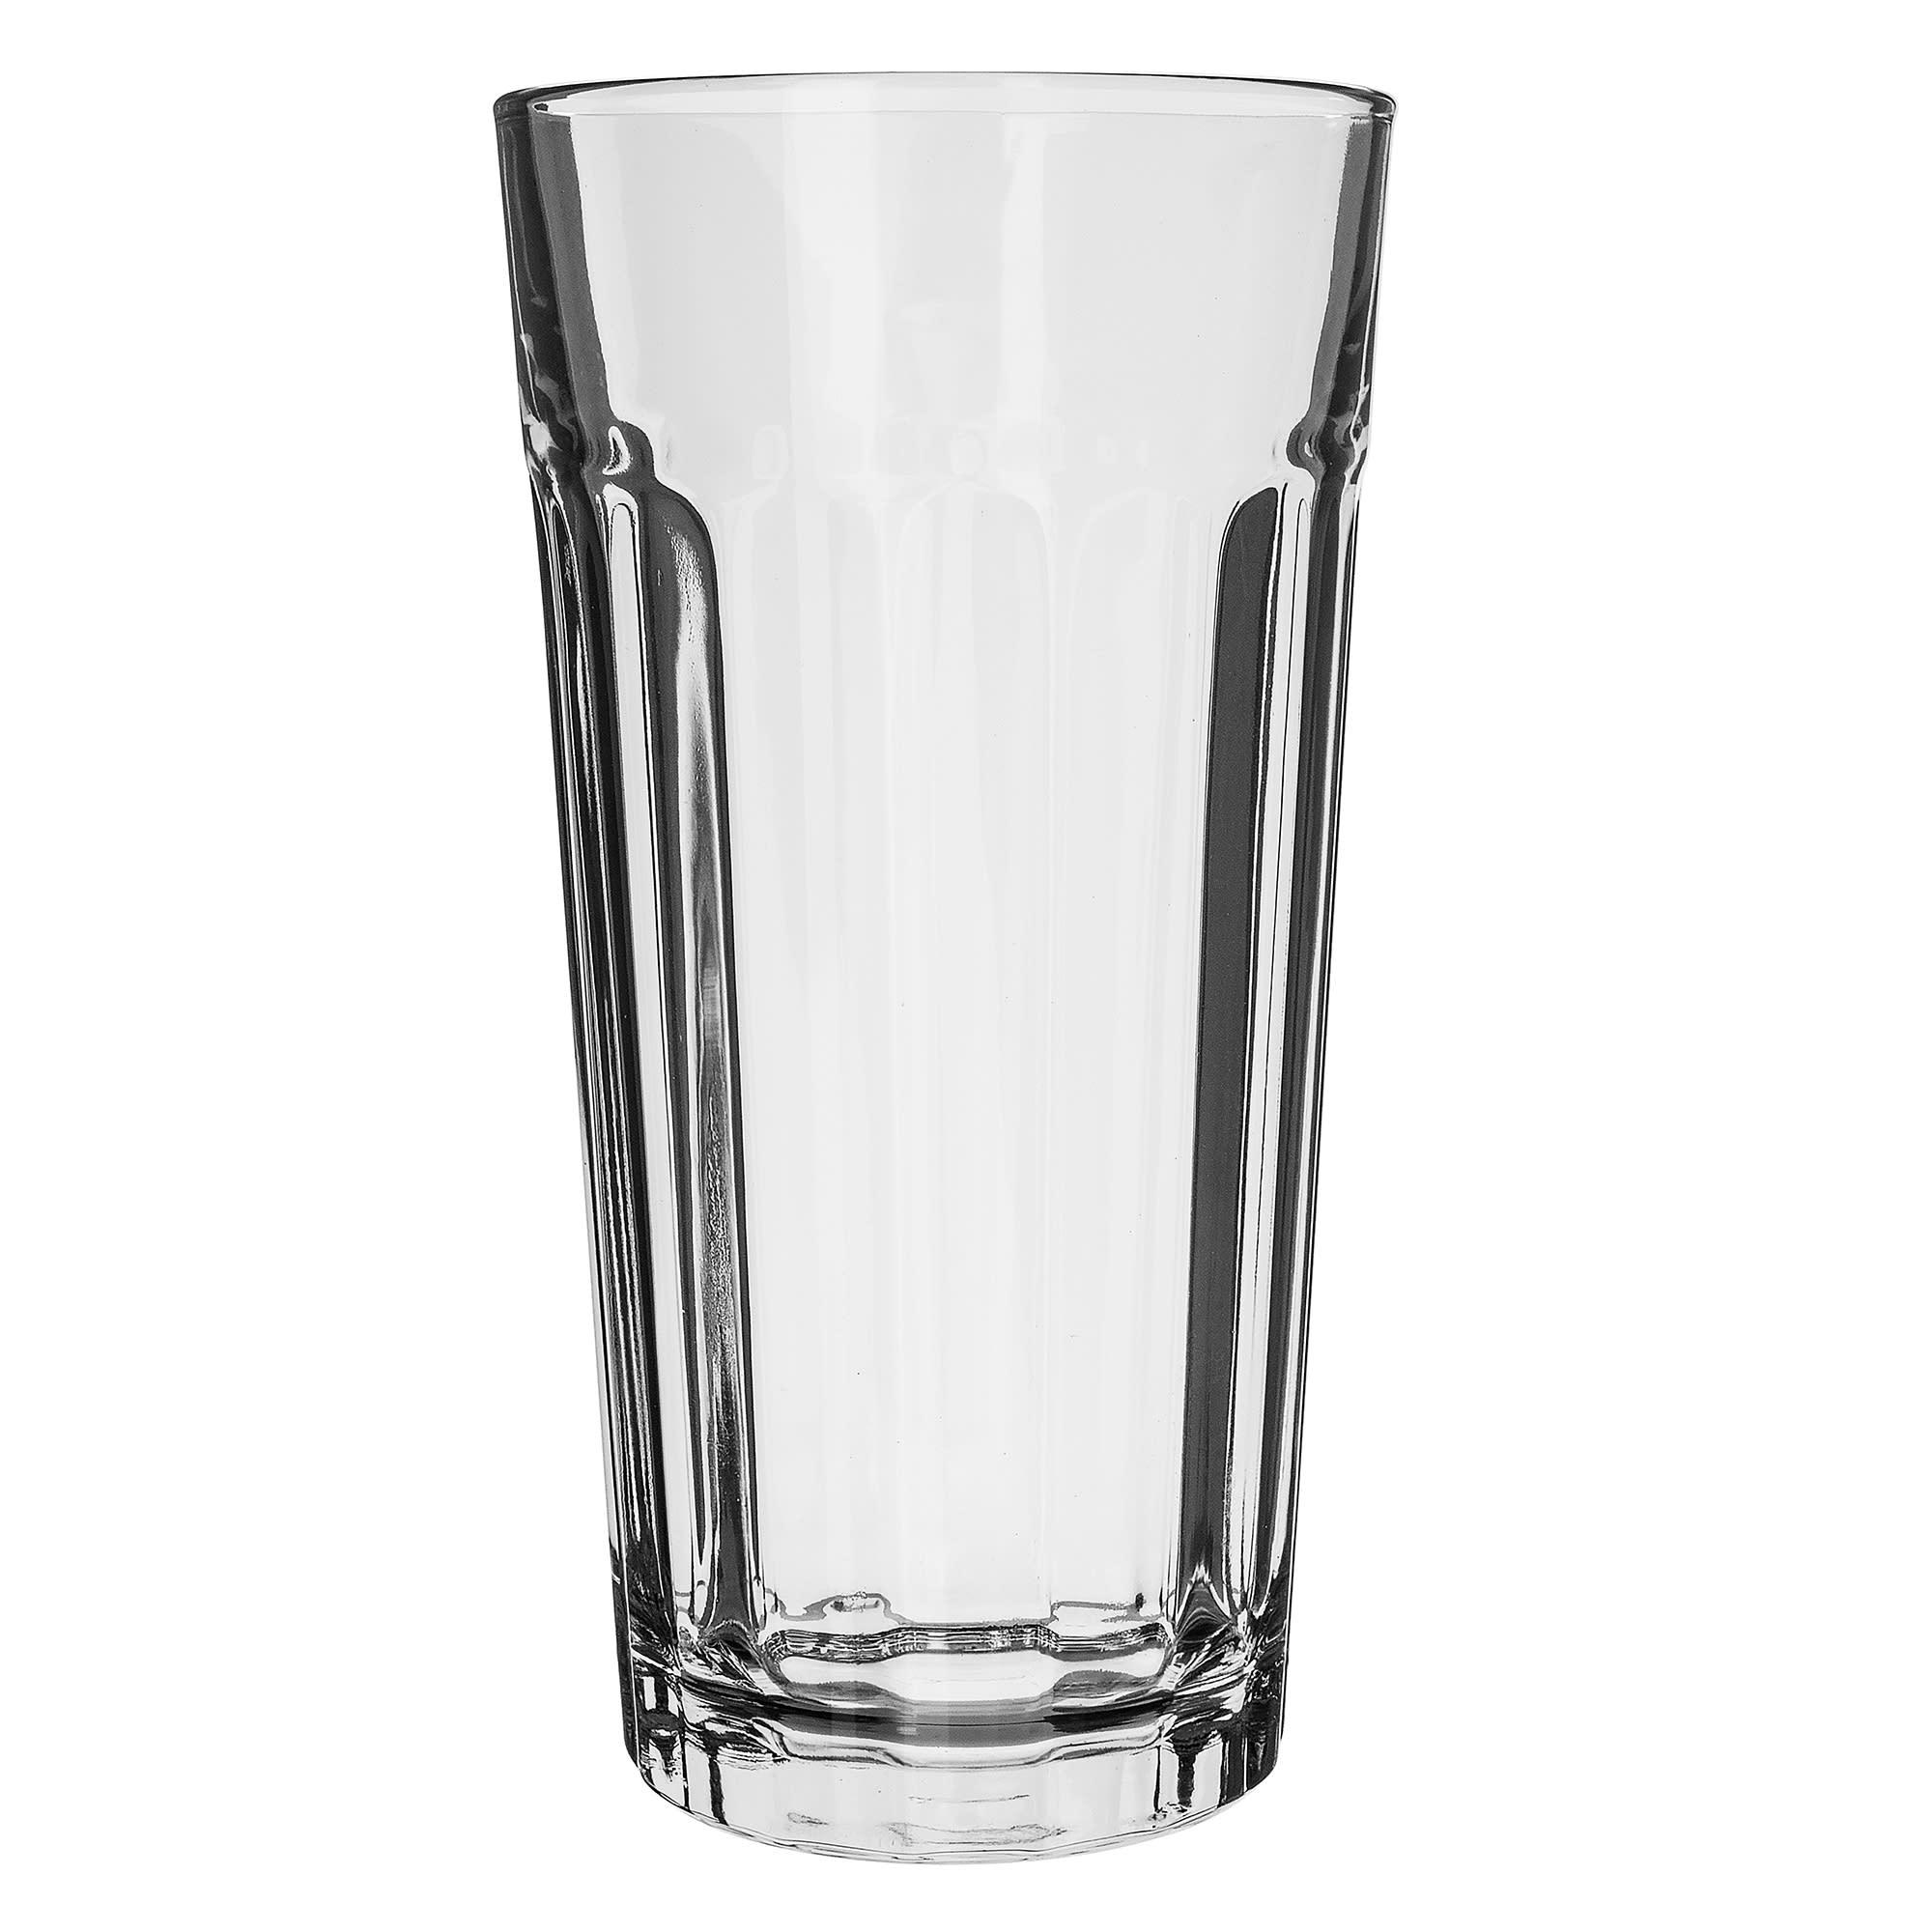 Libbey 15645 24-oz DuraTuff Paneled Glass Tumbler